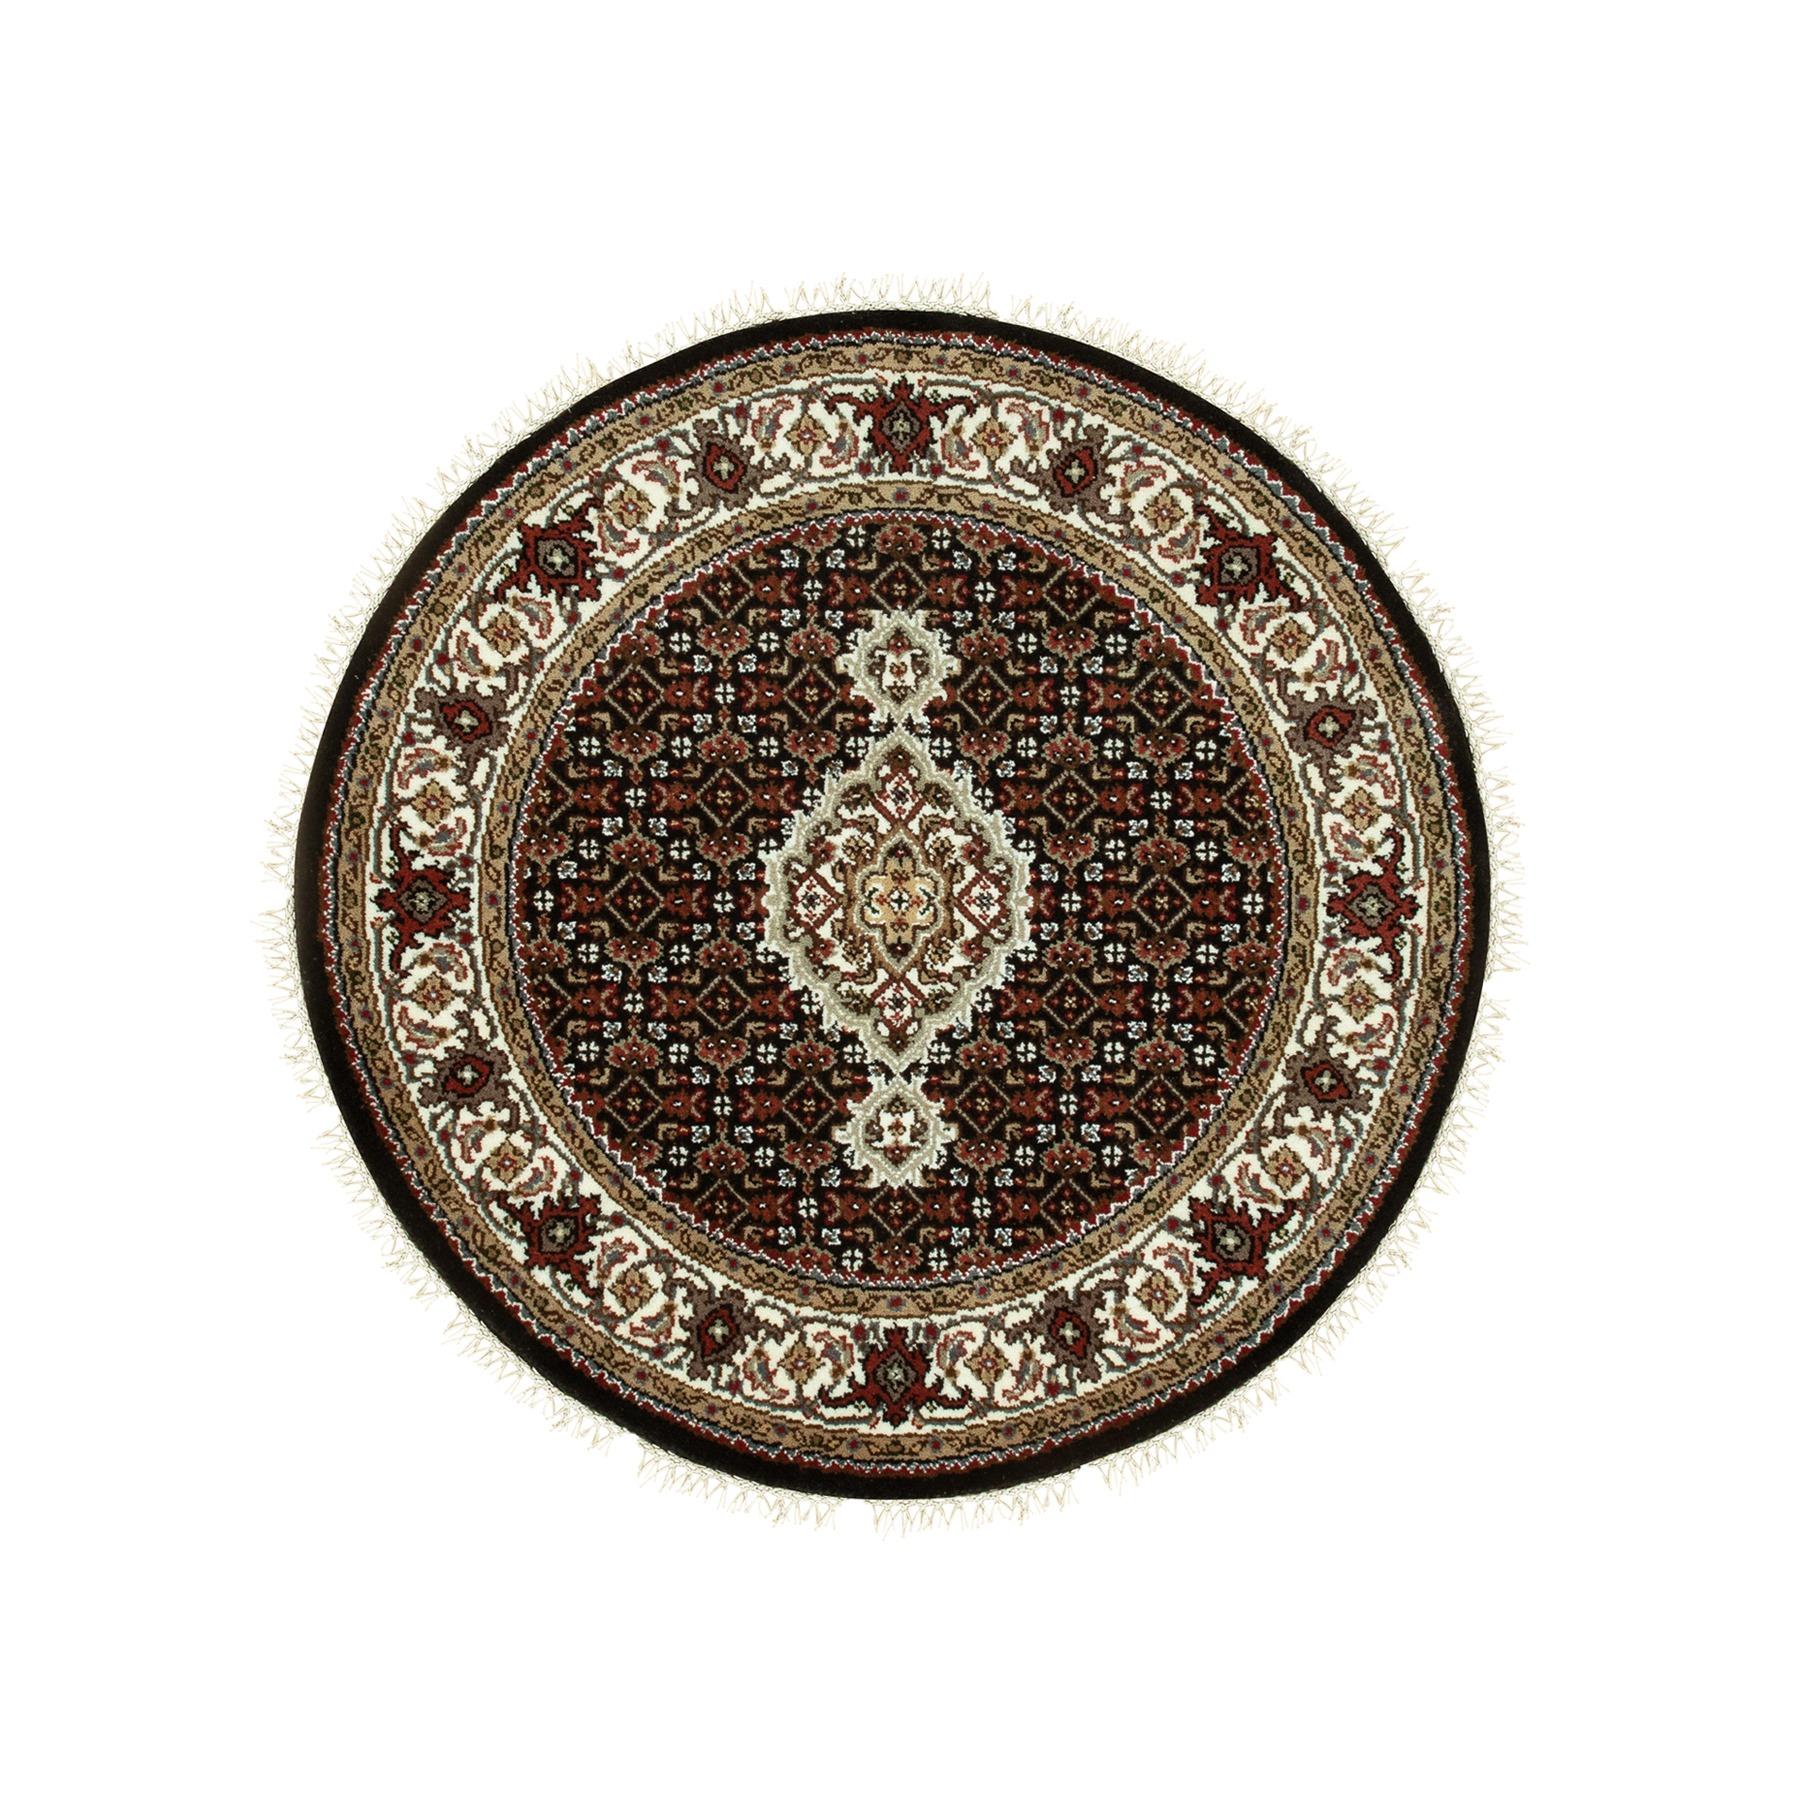 3'x3' Black Hand Knotted Fish Design Tabriz Mahi Wool And Silk Oriental Round Rug